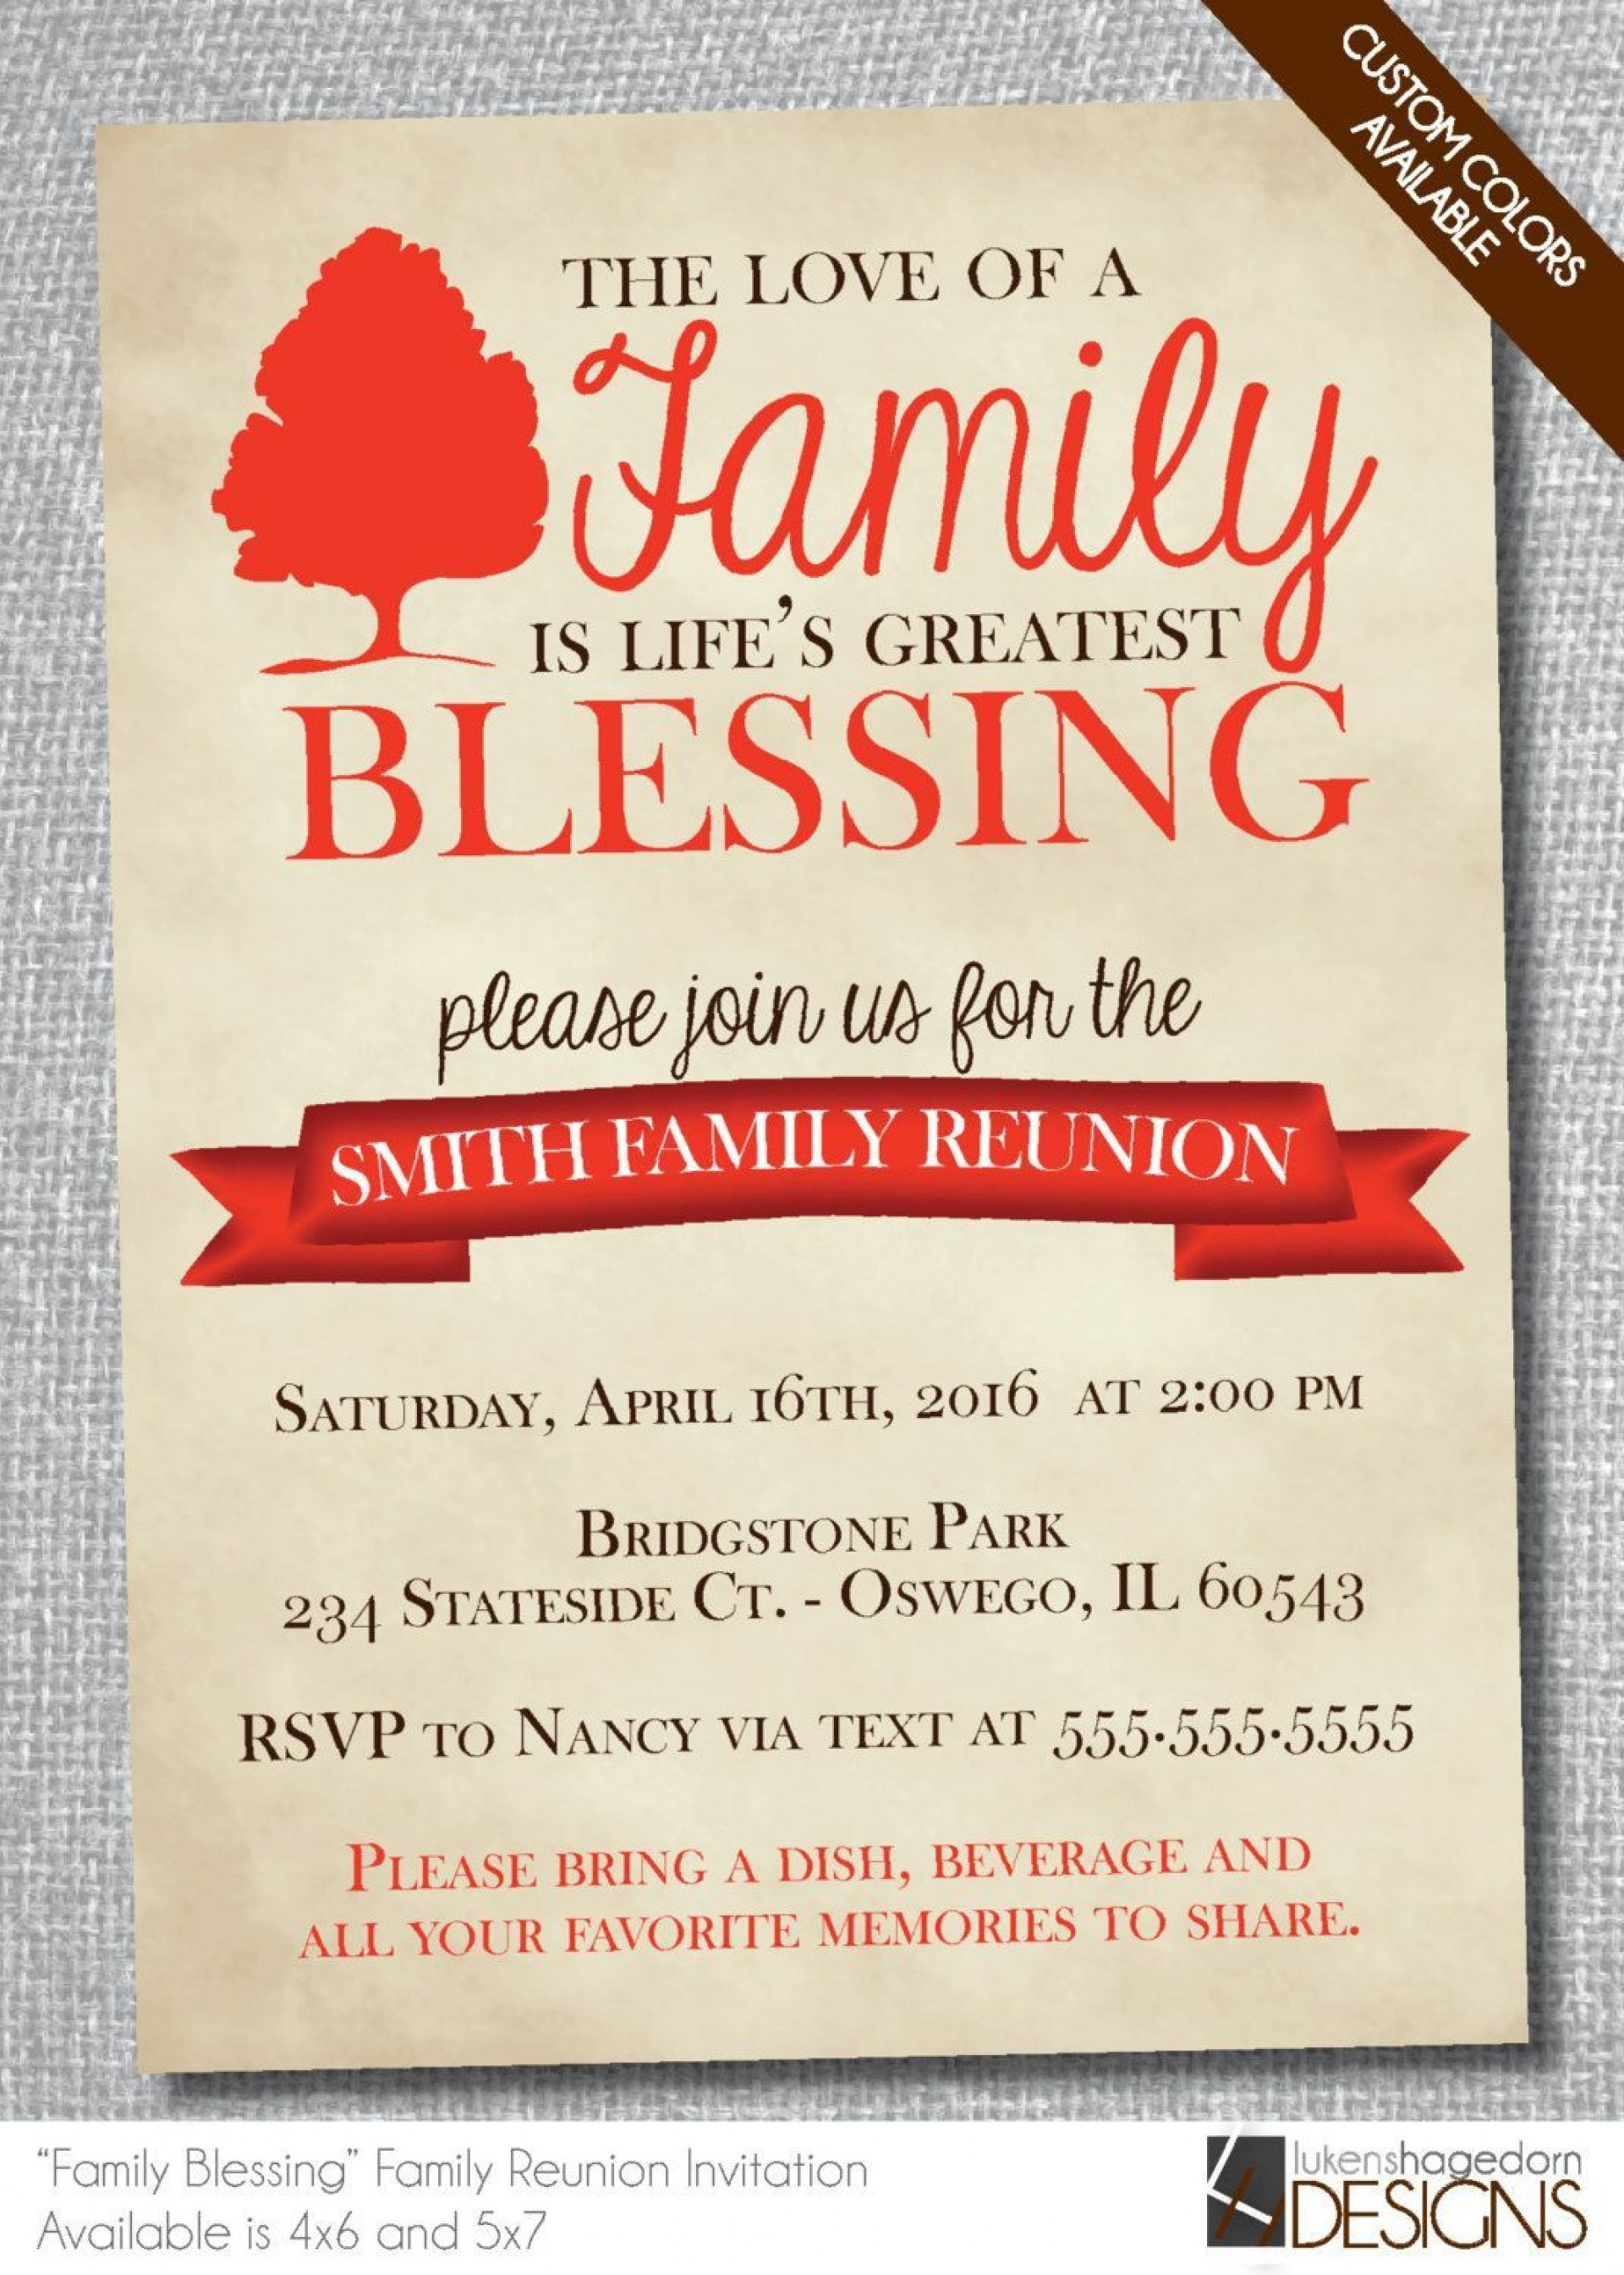 004 Impressive Family Reunion Flyer Template Free Sample  Downloadable Printable Invitation1920